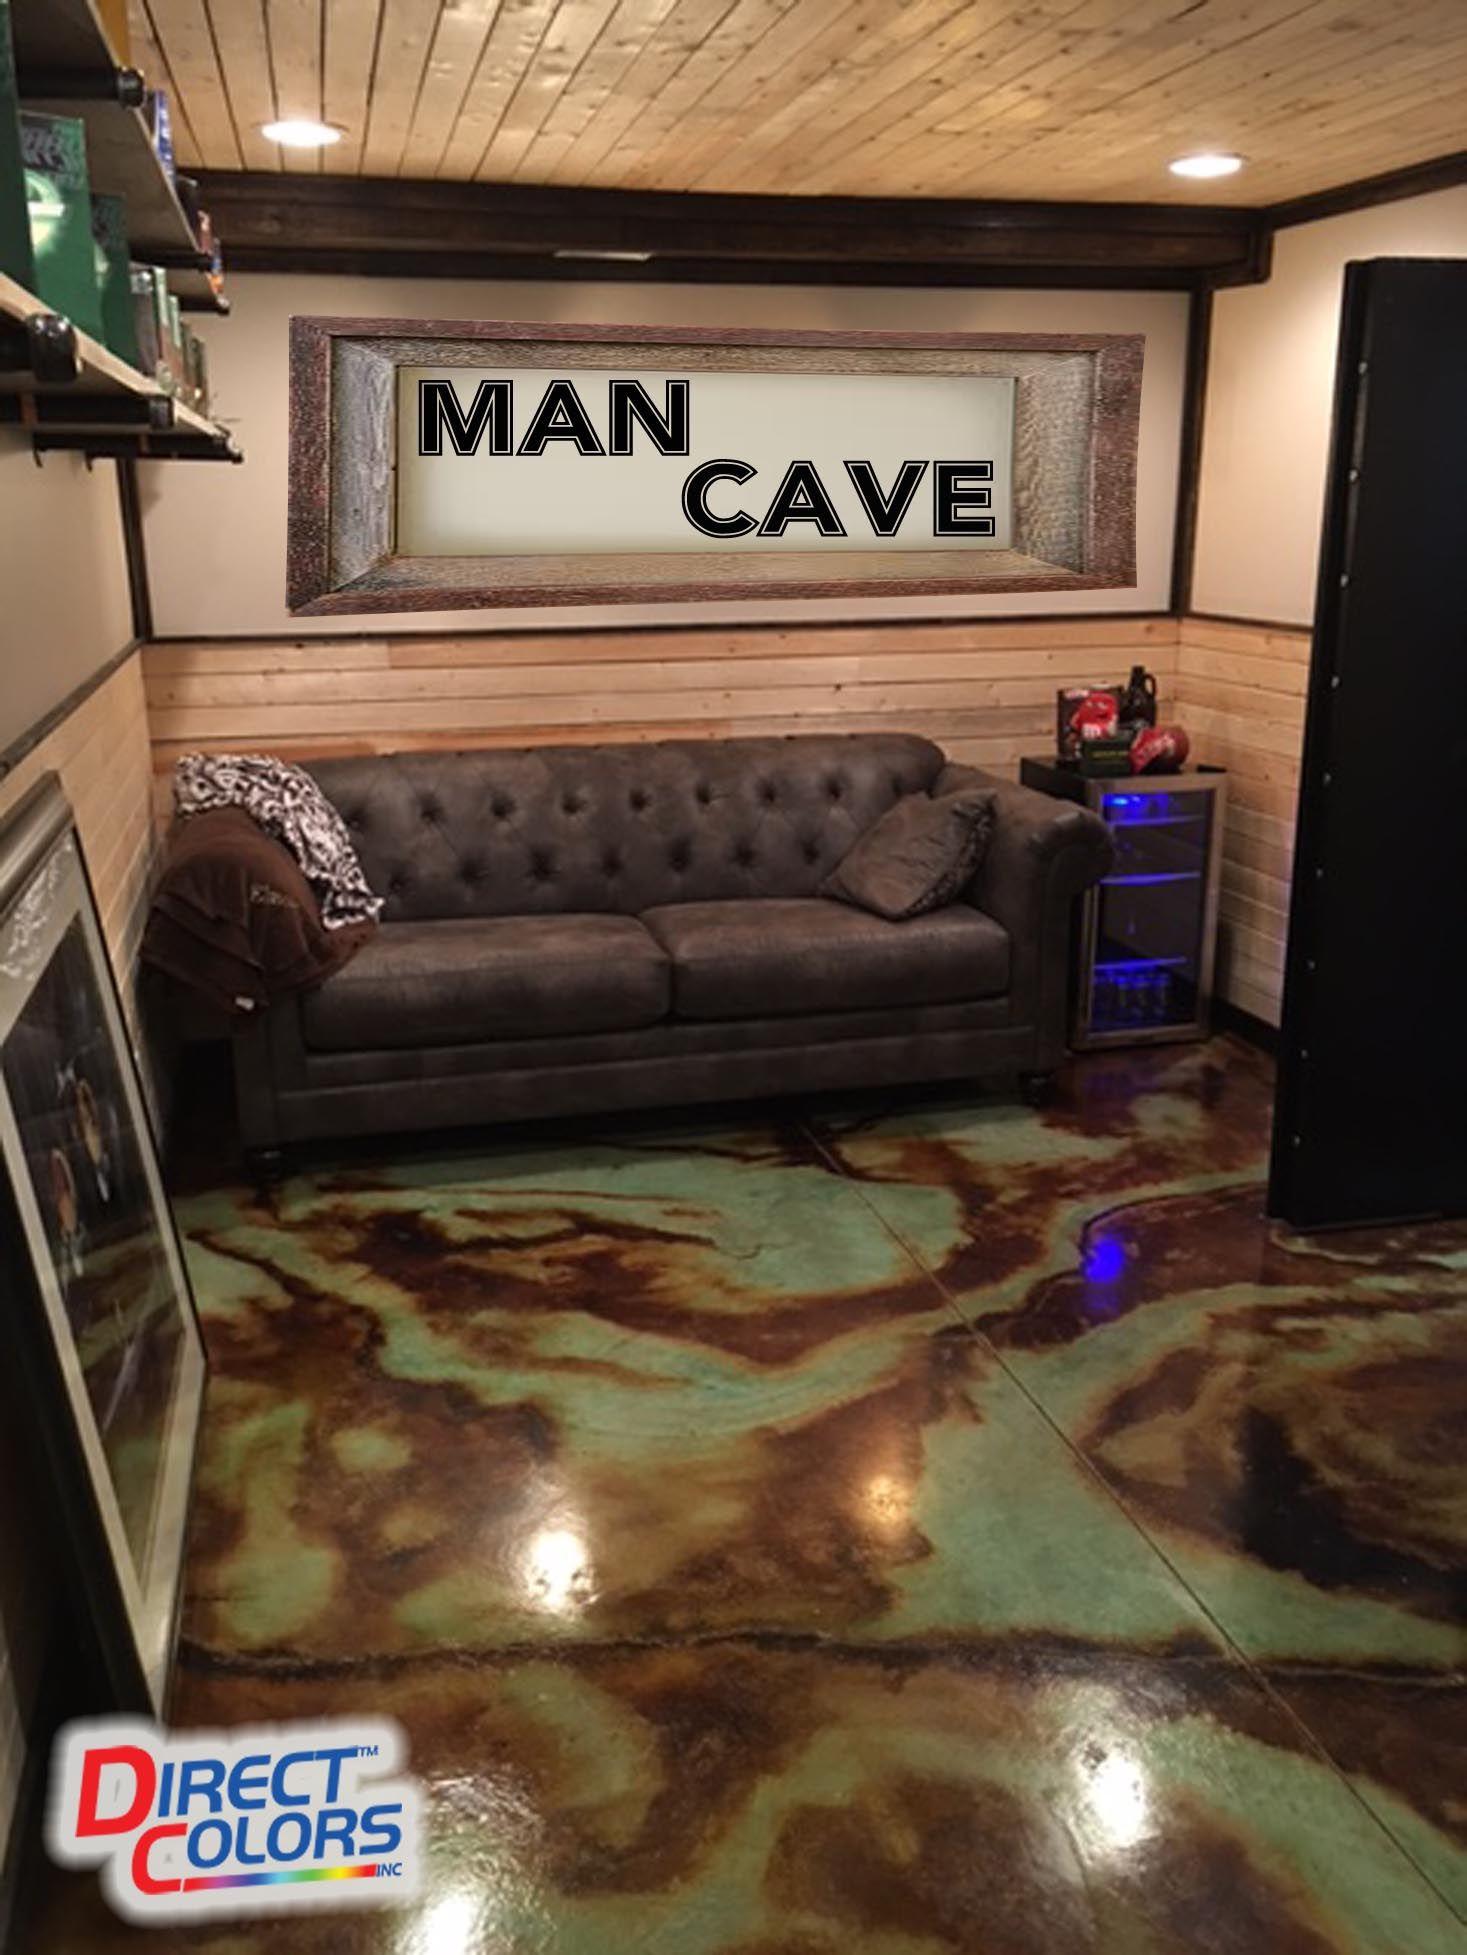 Build Your Own Man Cave Furniture : Concrete acid stain directcolors men